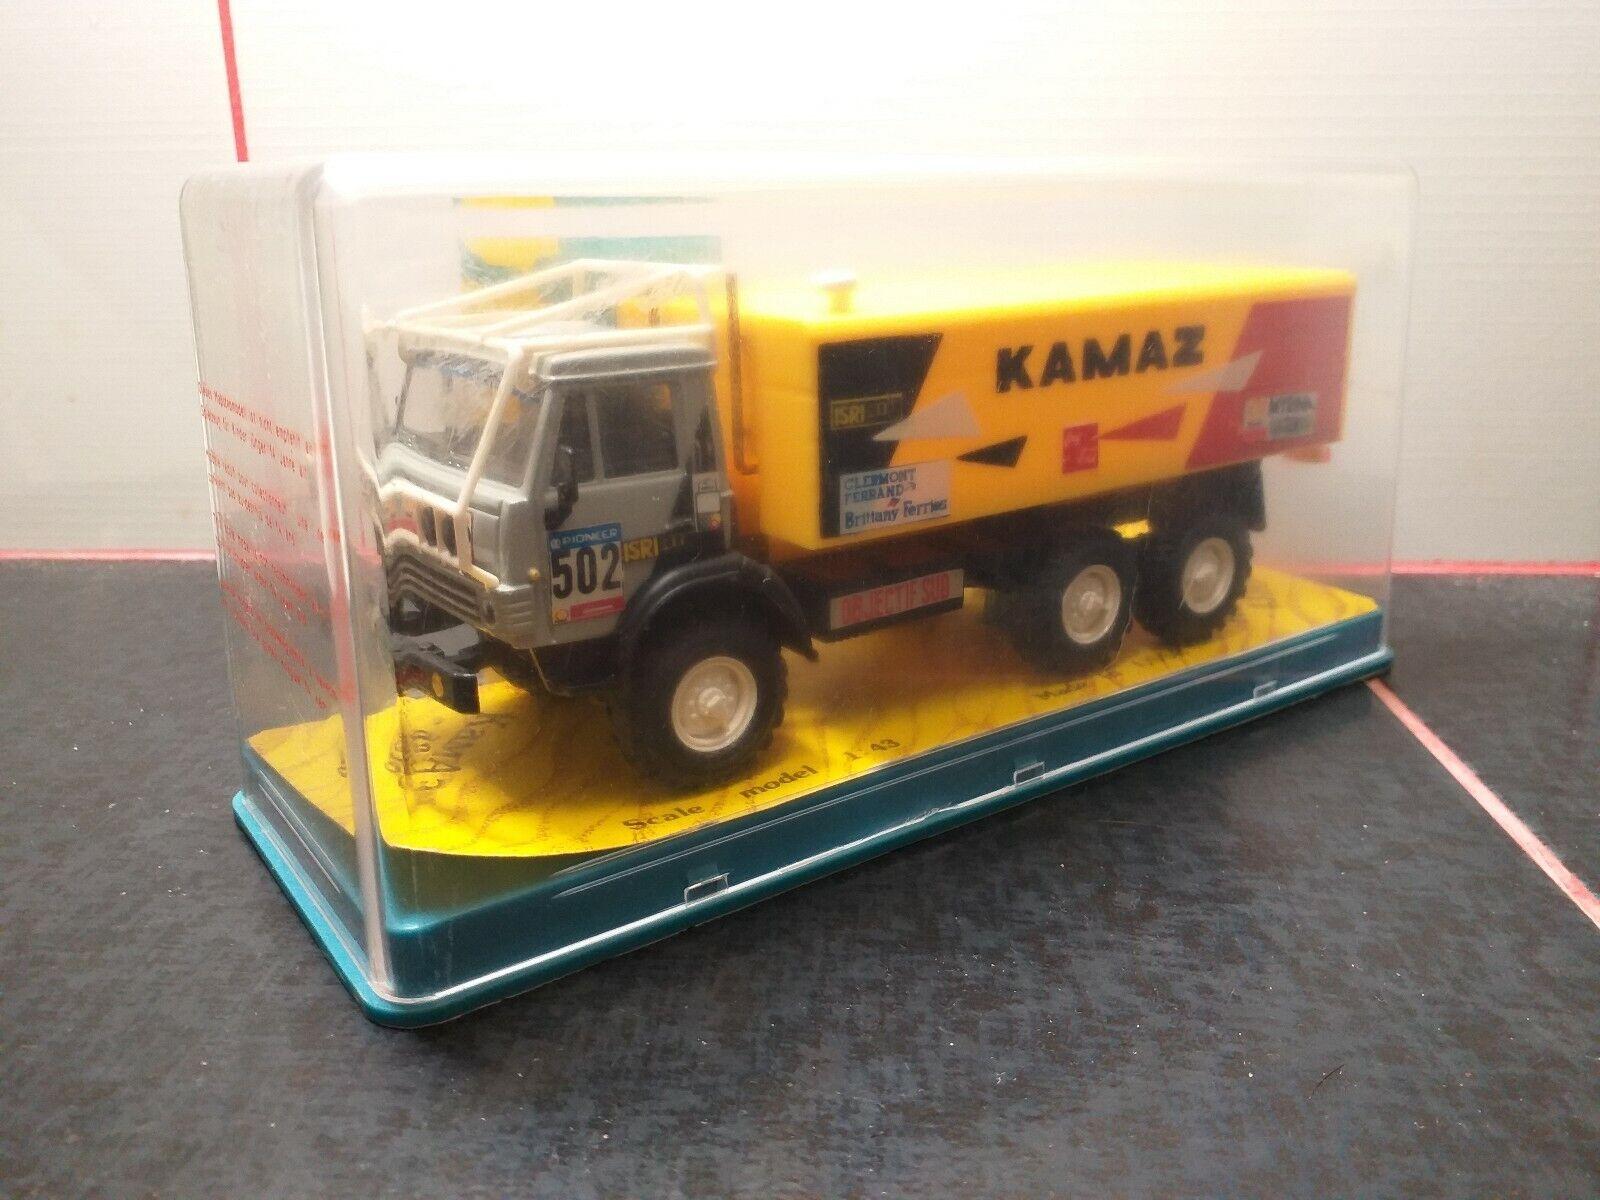 RARE KAMAZ - 4310 1 43 Rallye  502 made in URSS APEK